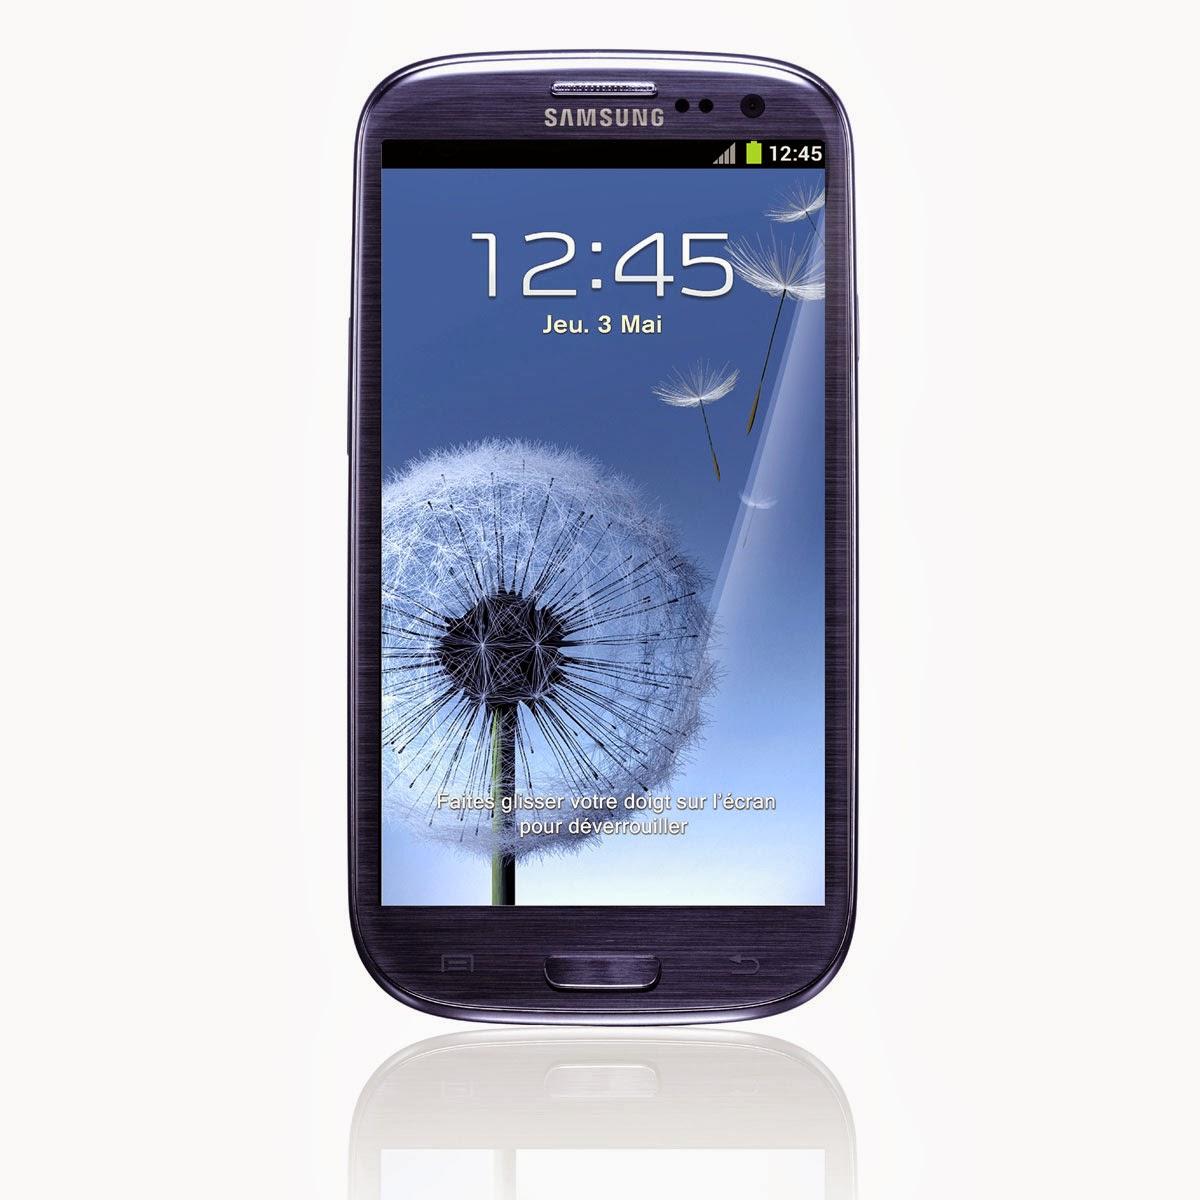 samsung galaxy s3 16go bleu comparaison smartphone. Black Bedroom Furniture Sets. Home Design Ideas